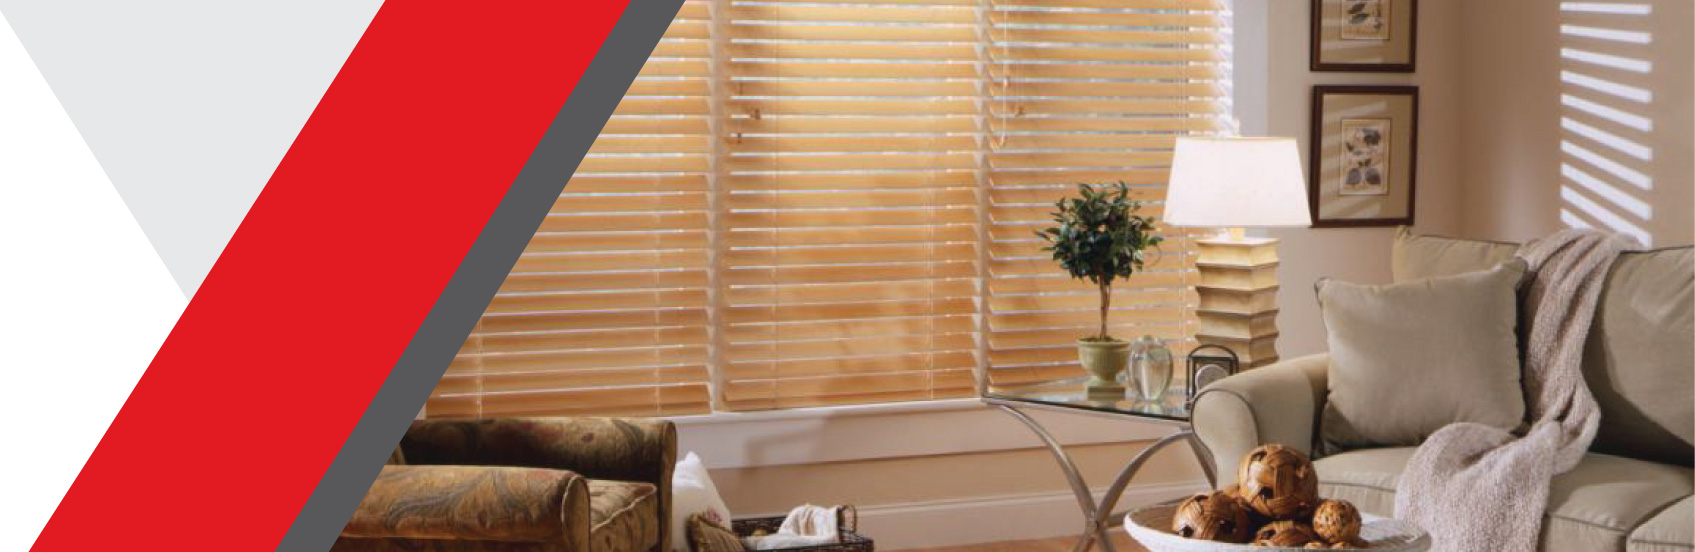 blinds-shutters